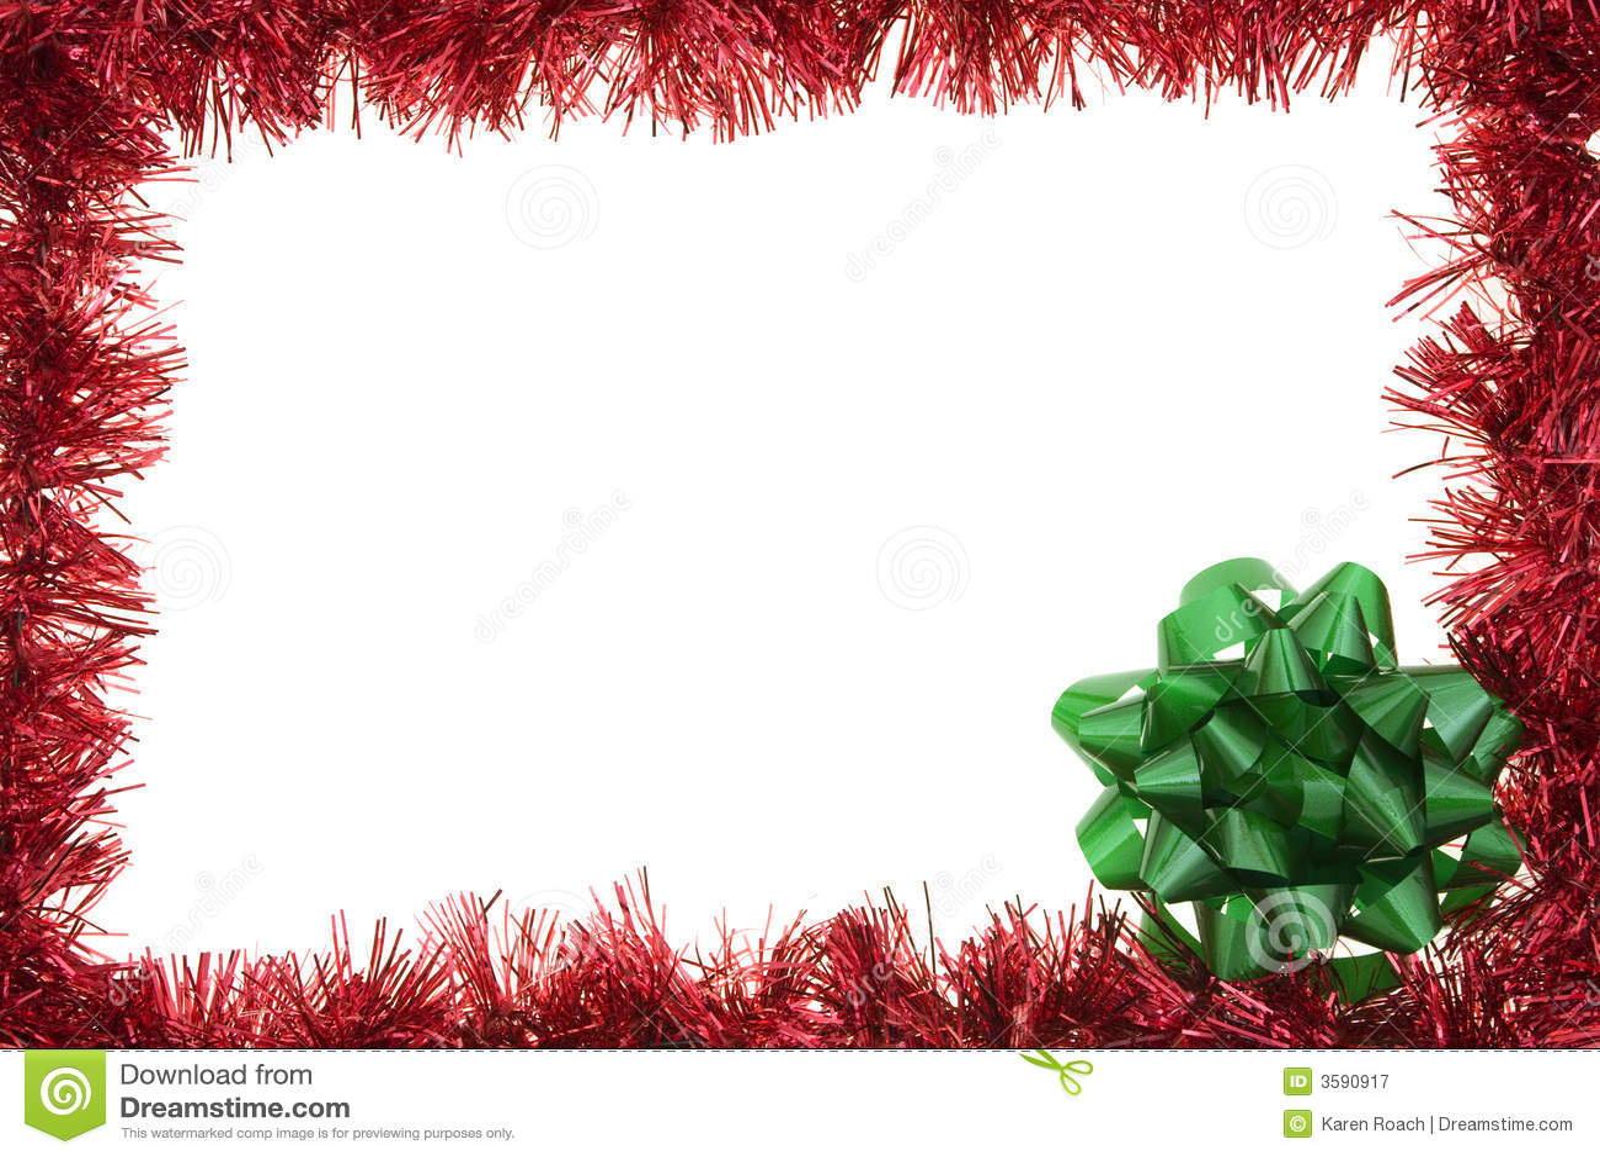 Garland holiday border stock image of december